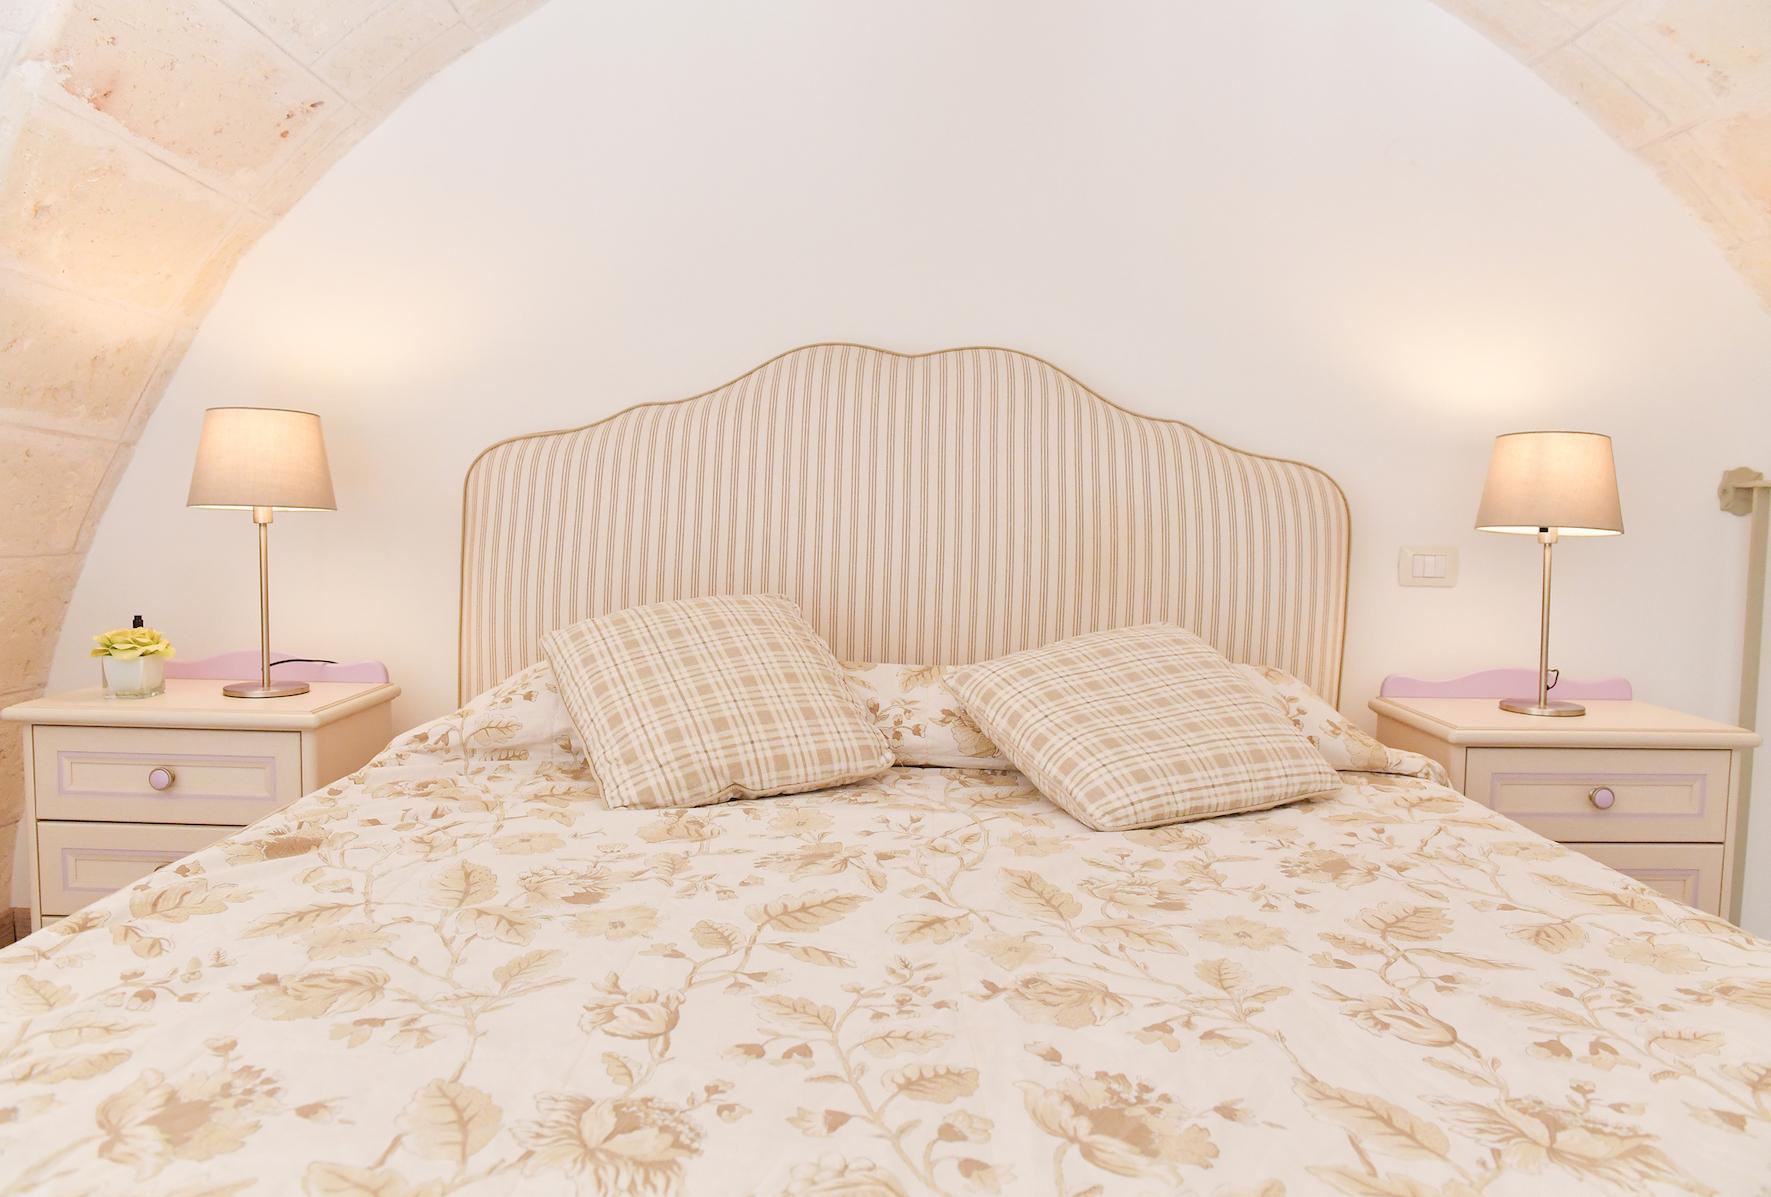 Lecce 5 -kamer op de tussenverdieping